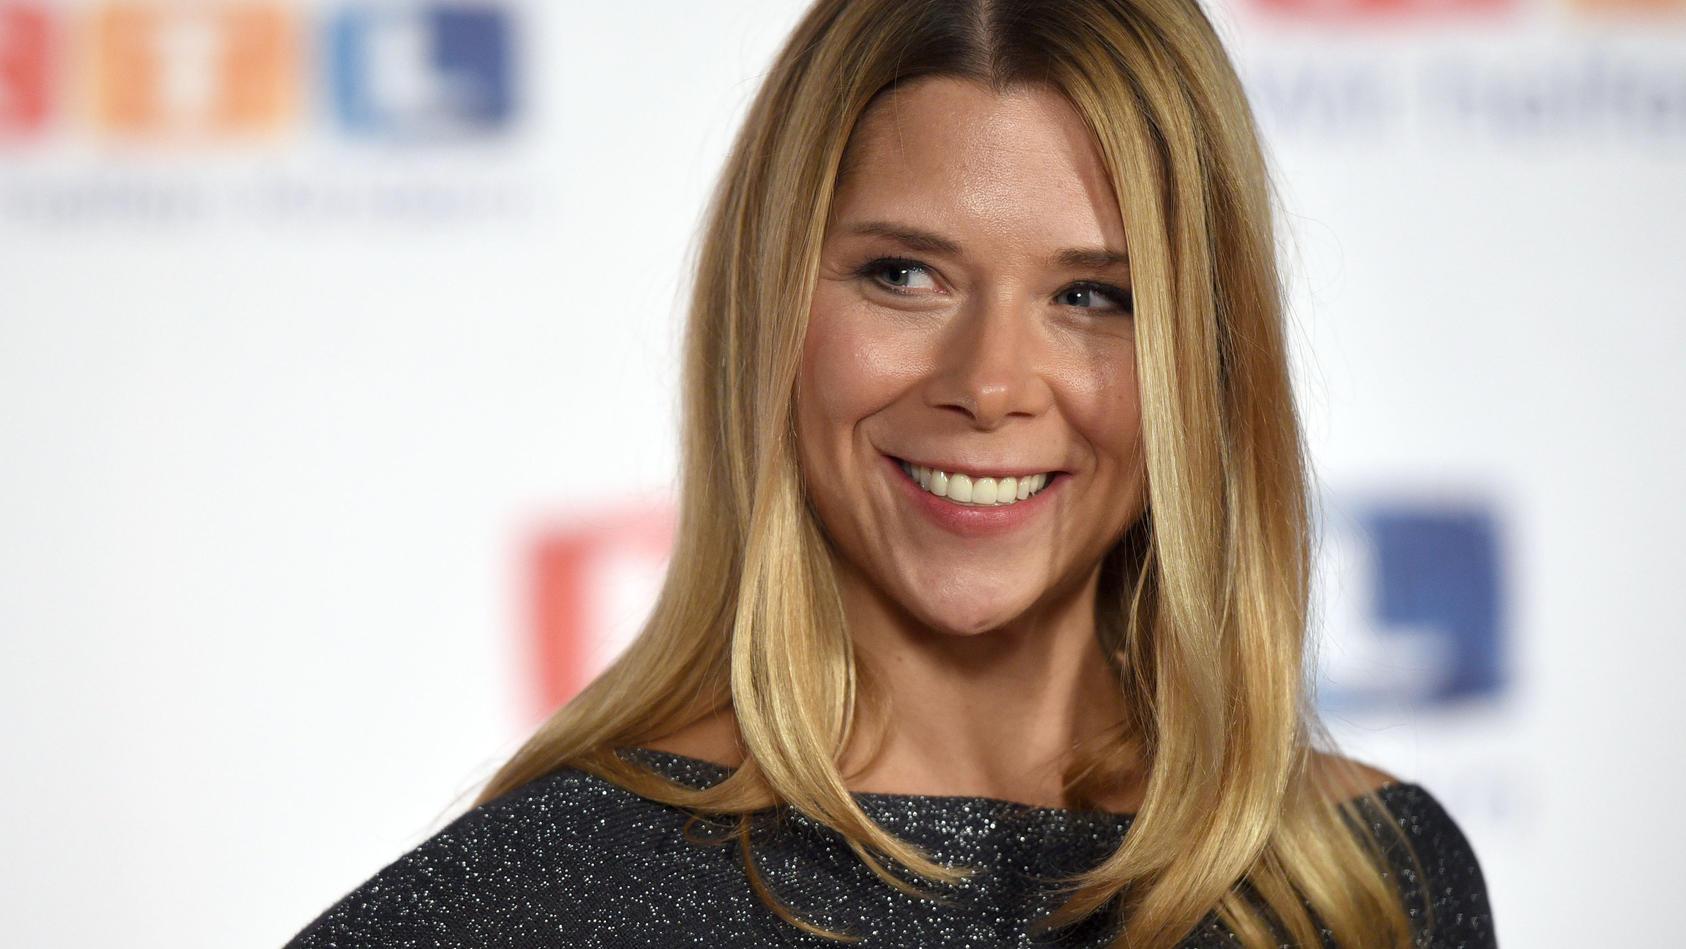 Tanja Szewczenko schwebt auf Mama-Wolke-Sieben.